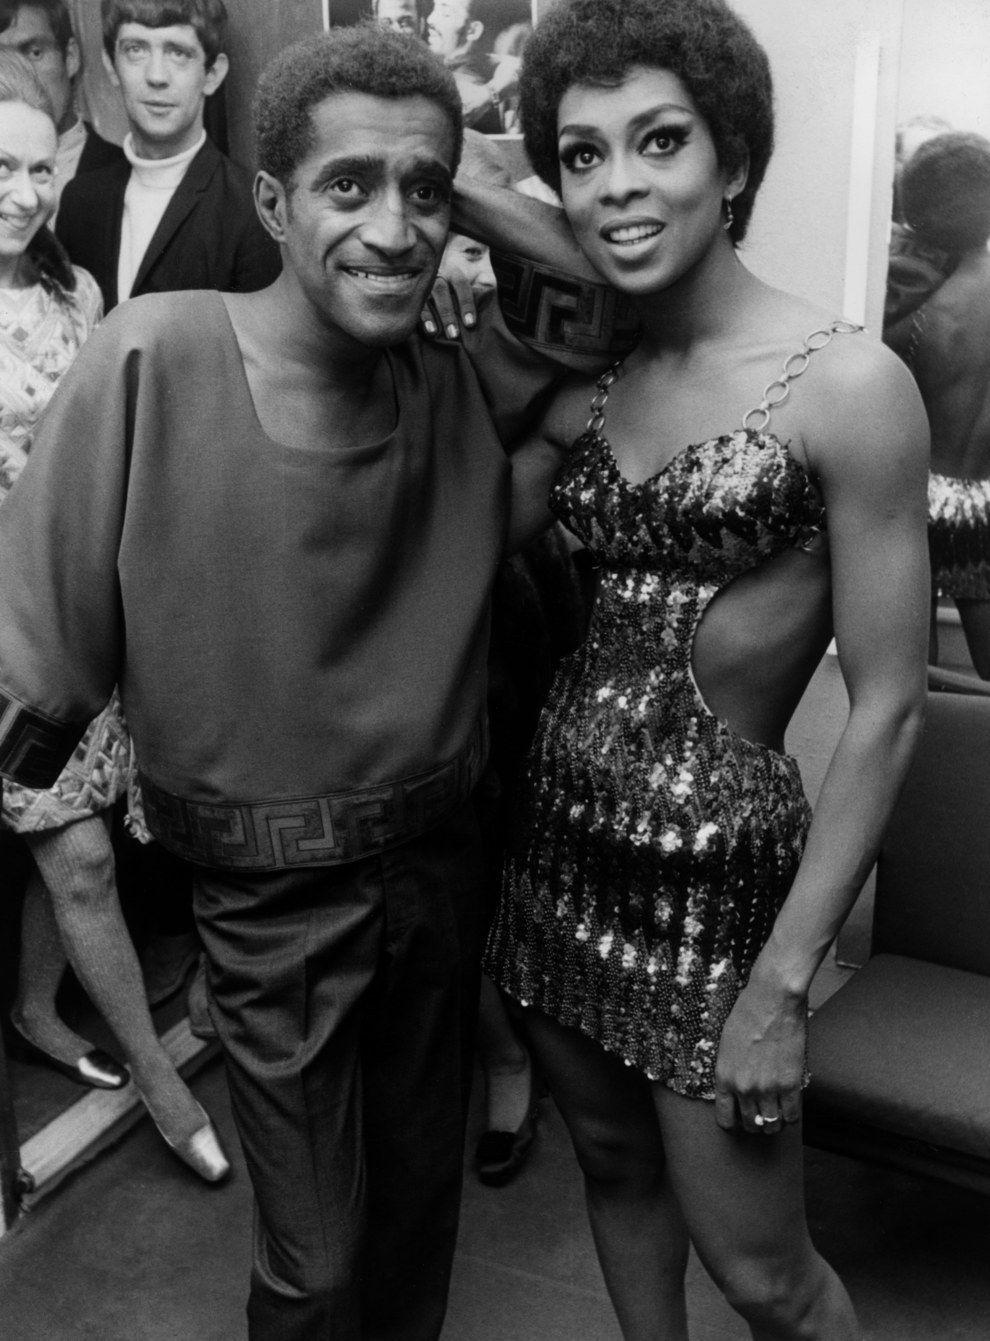 Sammy Davis Jr. and Lola Falana